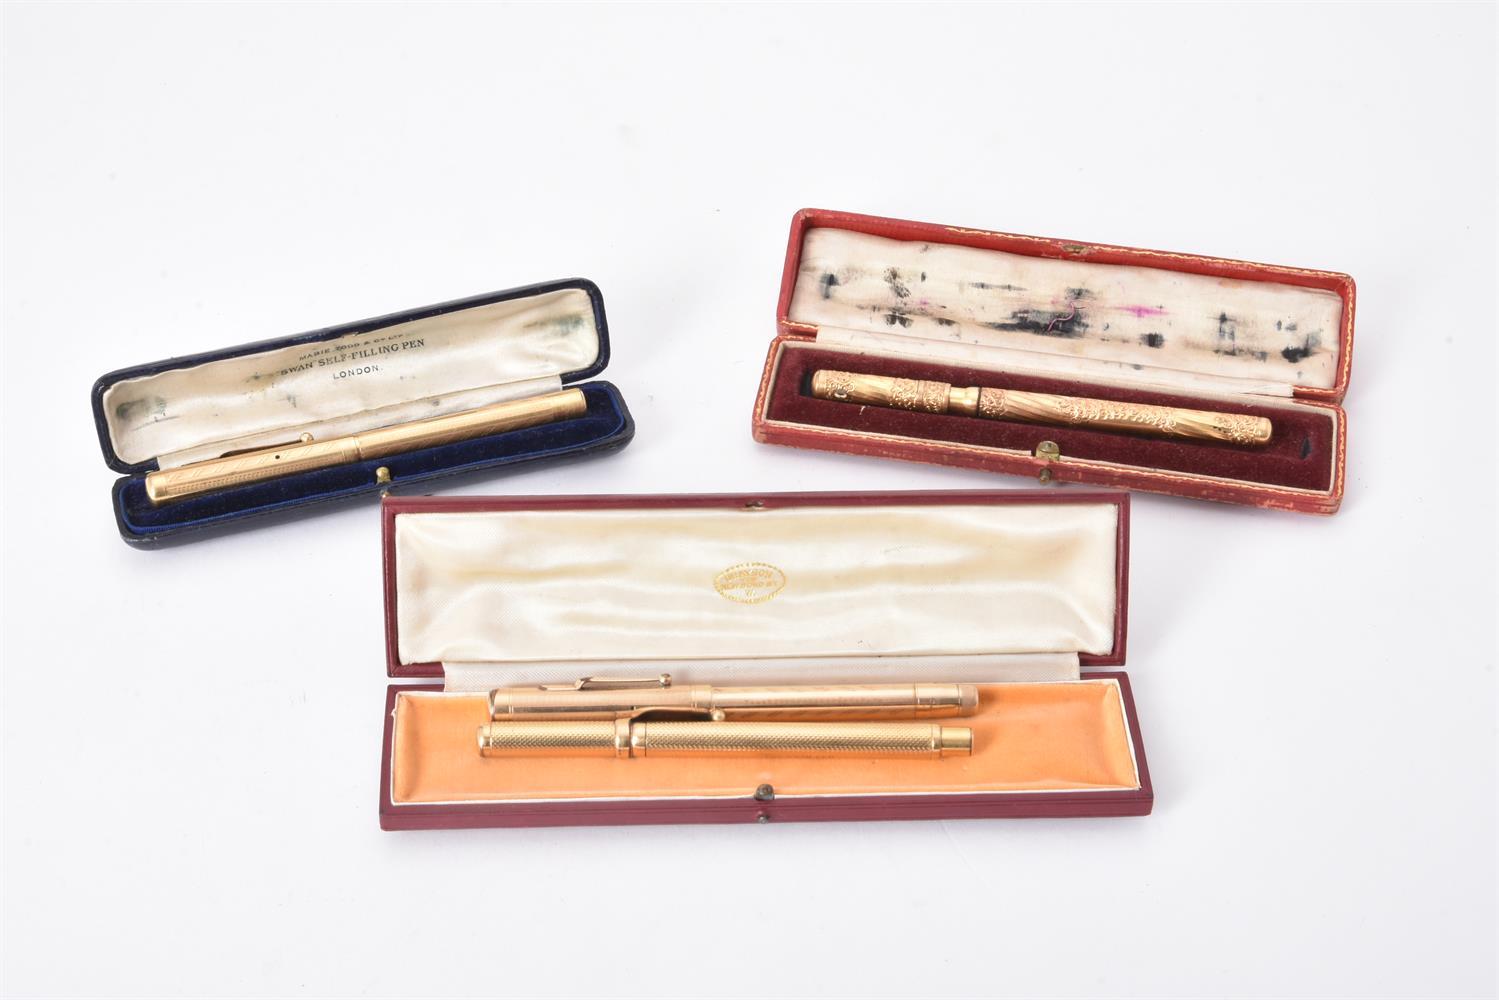 Mabie Todd & Co., Swan, a gilt metal fountain pen